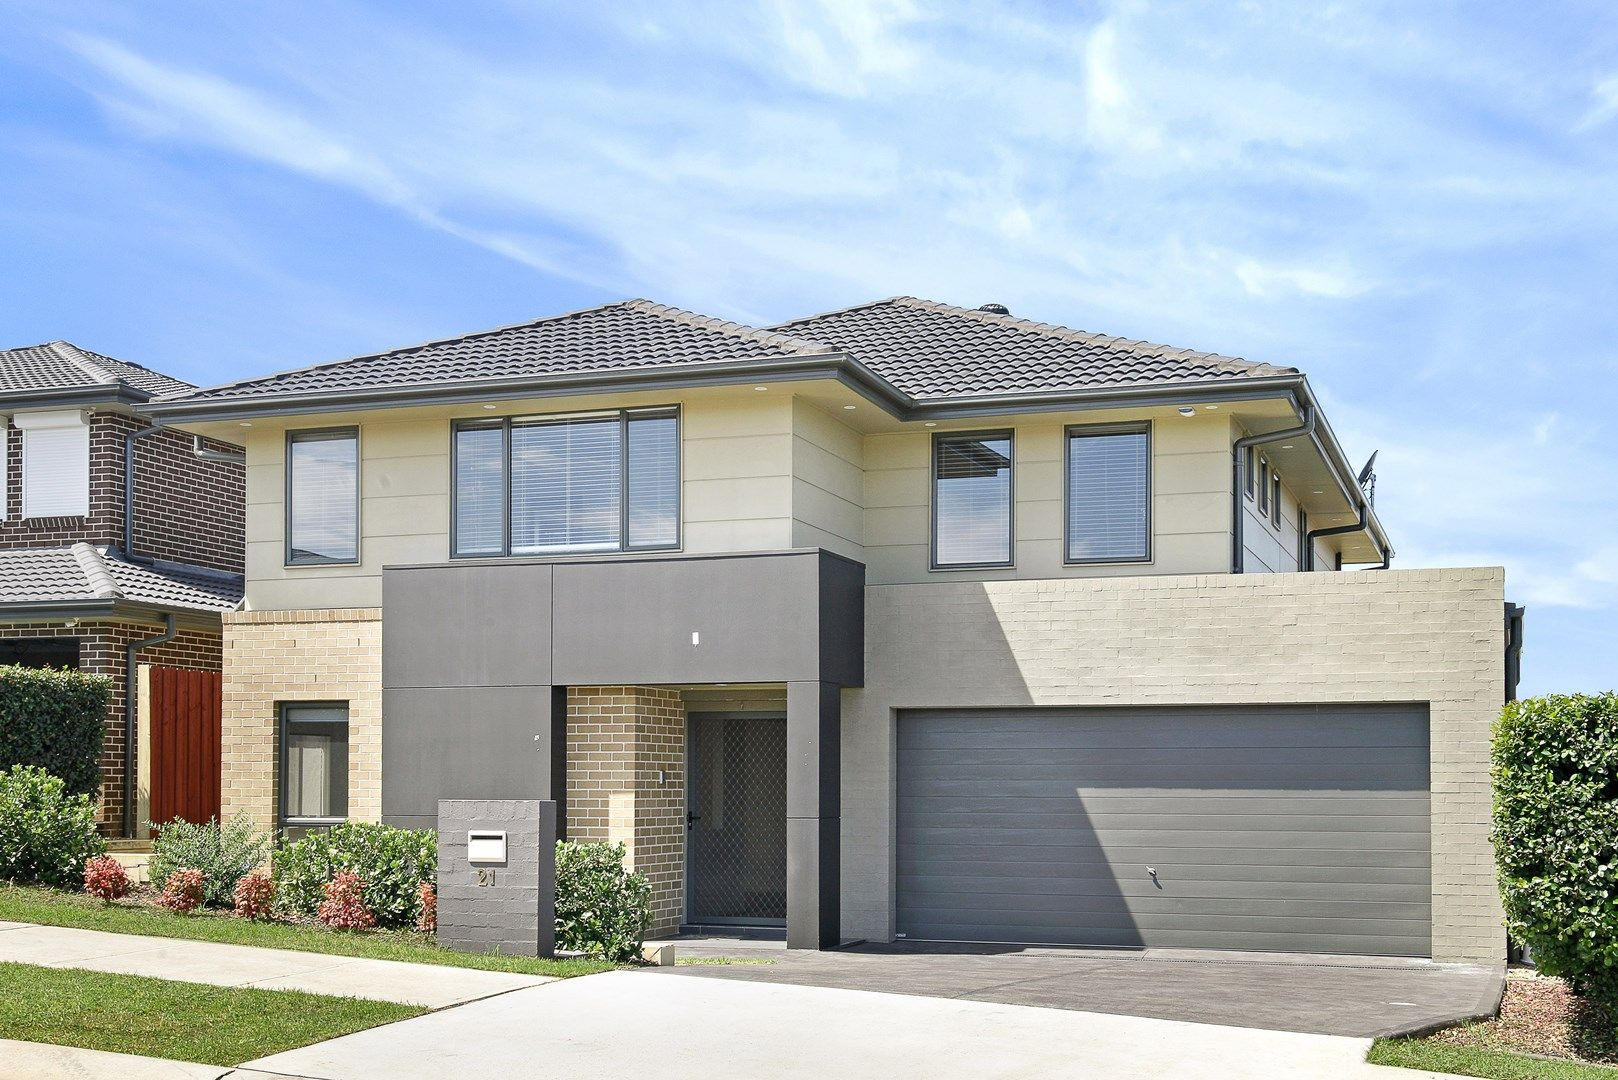 21 Thomas Hassall Ave, Middleton Grange NSW 2171, Image 0